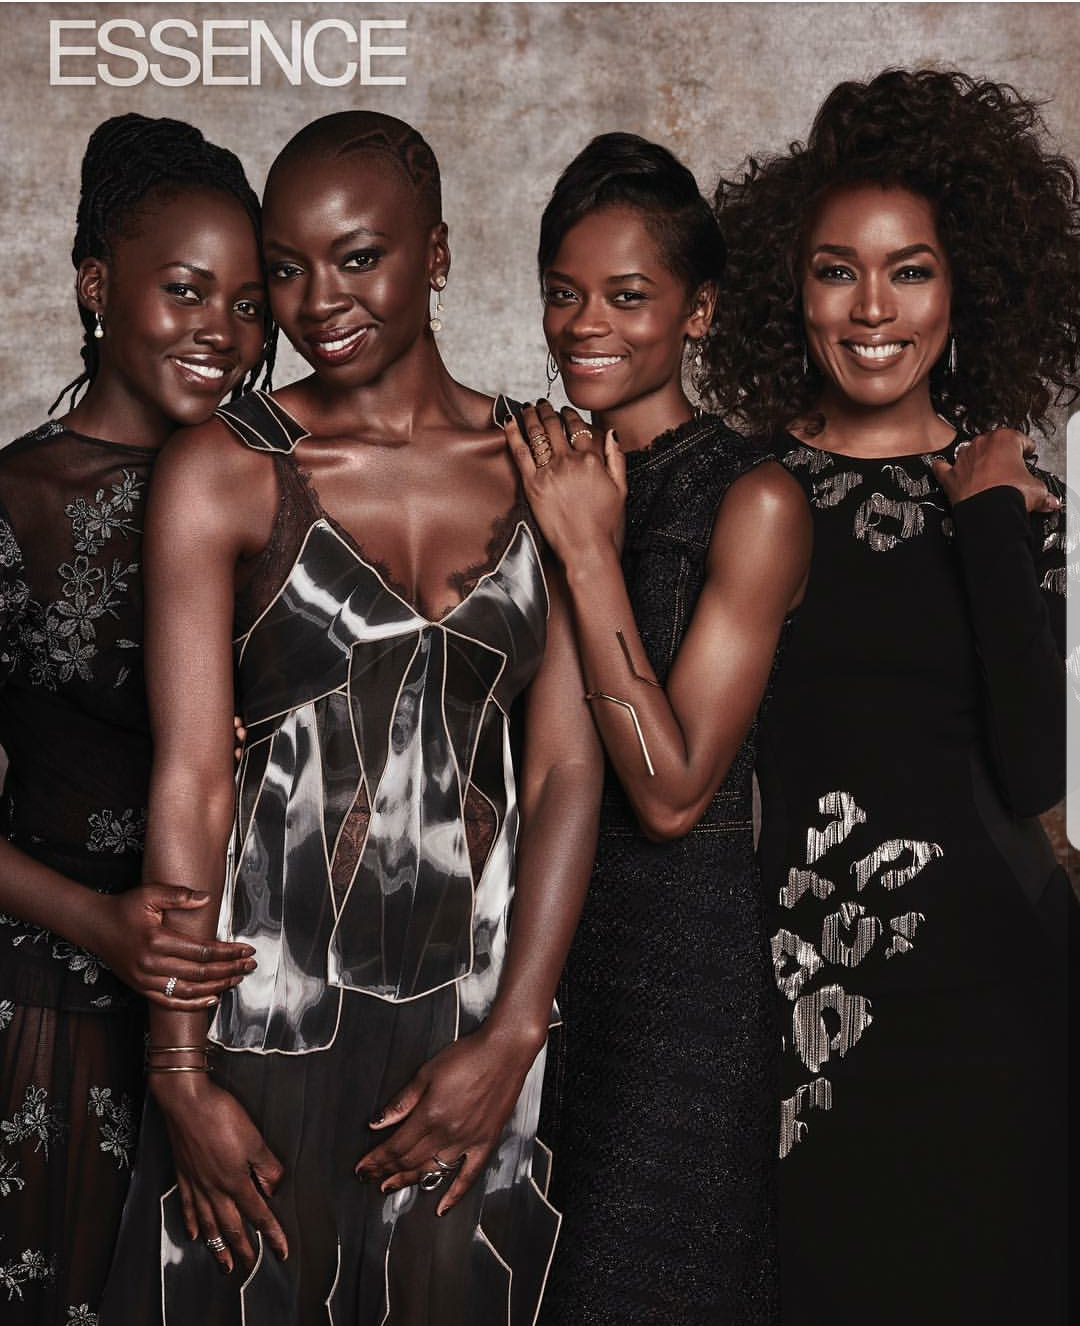 Nakia (Lupita Nyong'o),  Okoye (Danai Gurira),   Shuri (Letitia Wright),  Queen Ramonda (Angela Bassett) in Essence. Photo: Dennis Leupold